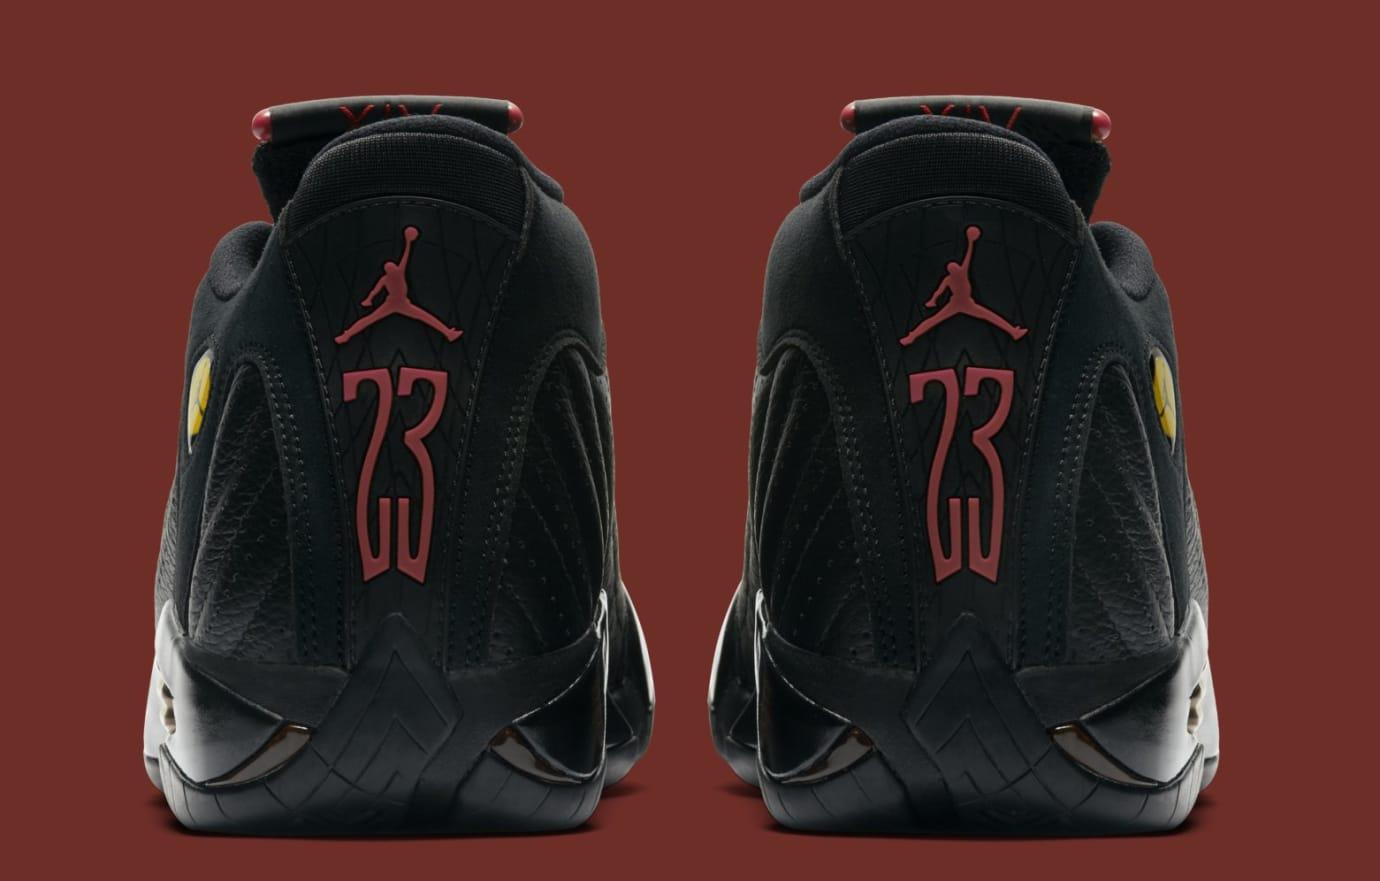 Air Jordan 14 Retro 'Last Shot' 487471-003 (Heel)